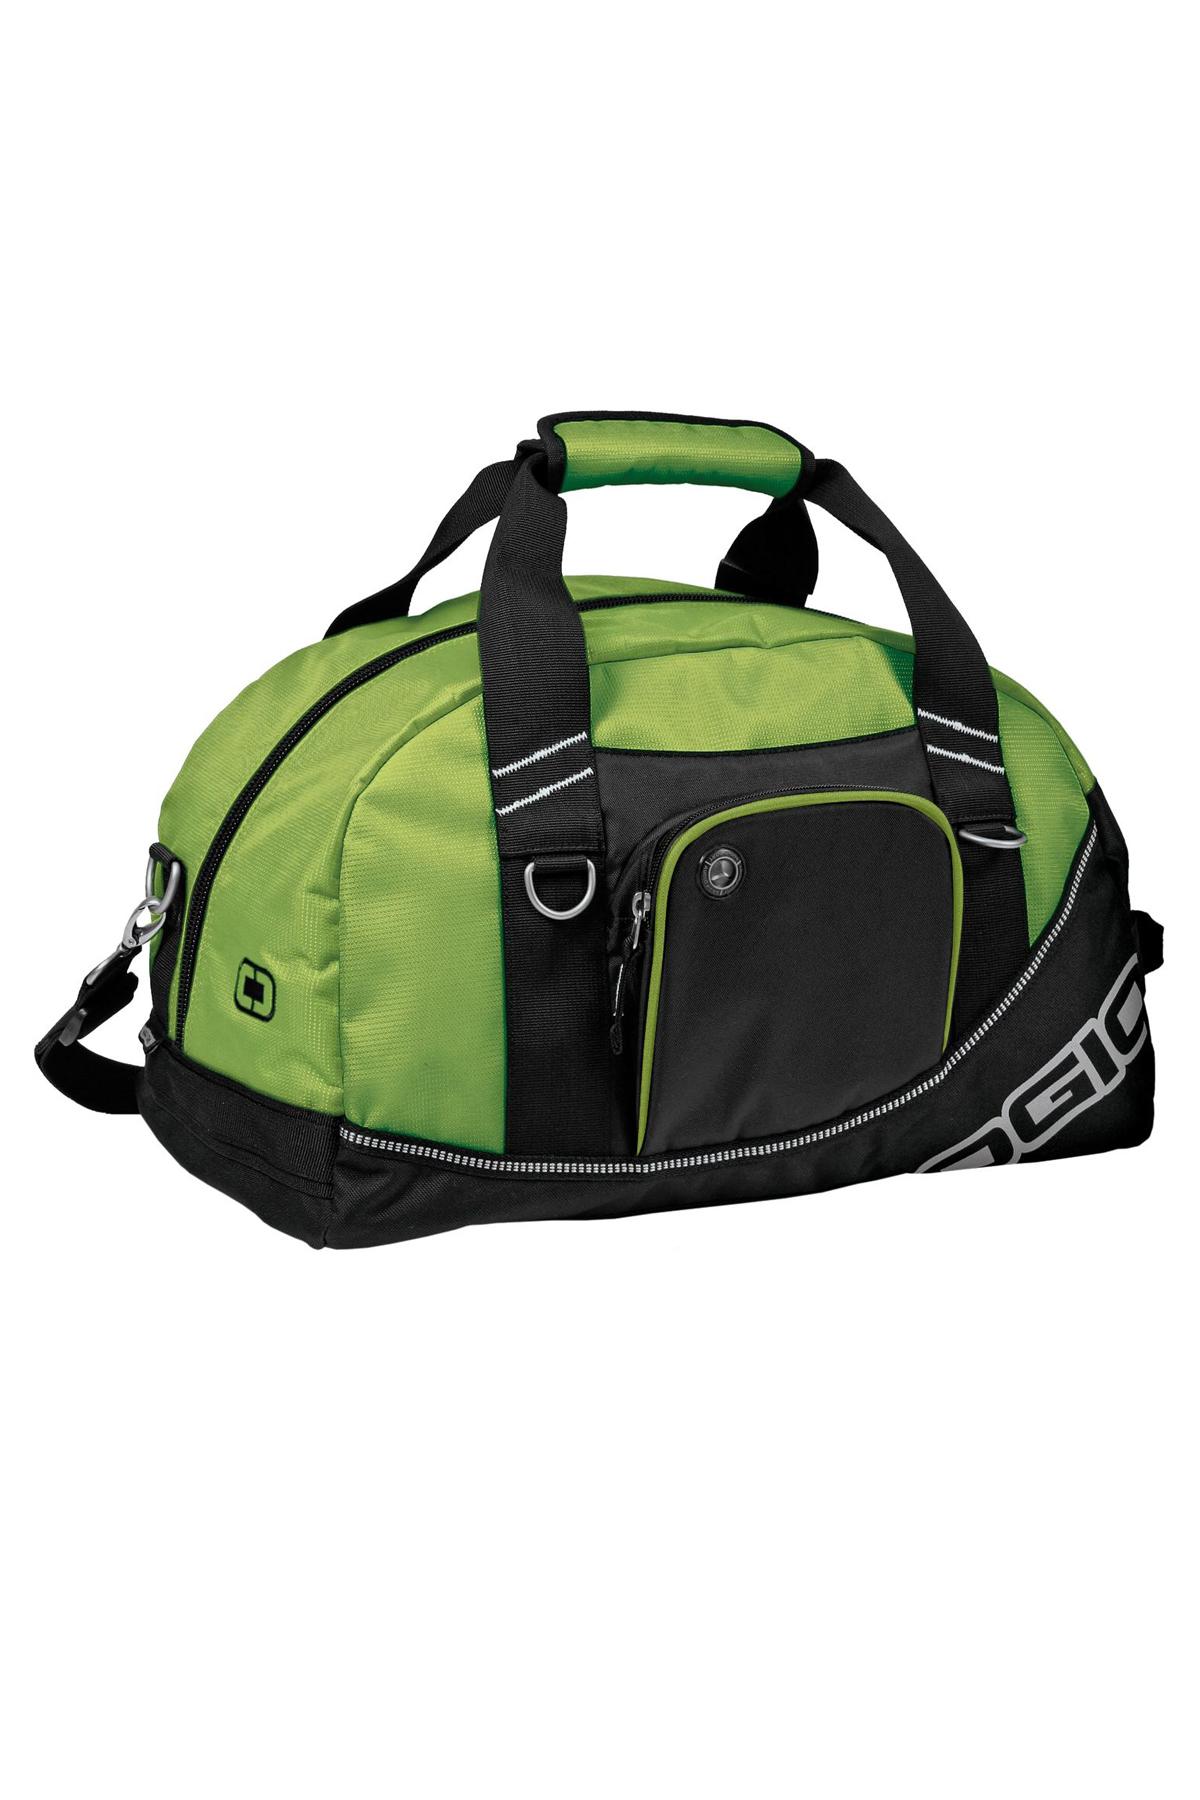 Bags-Duffels-10